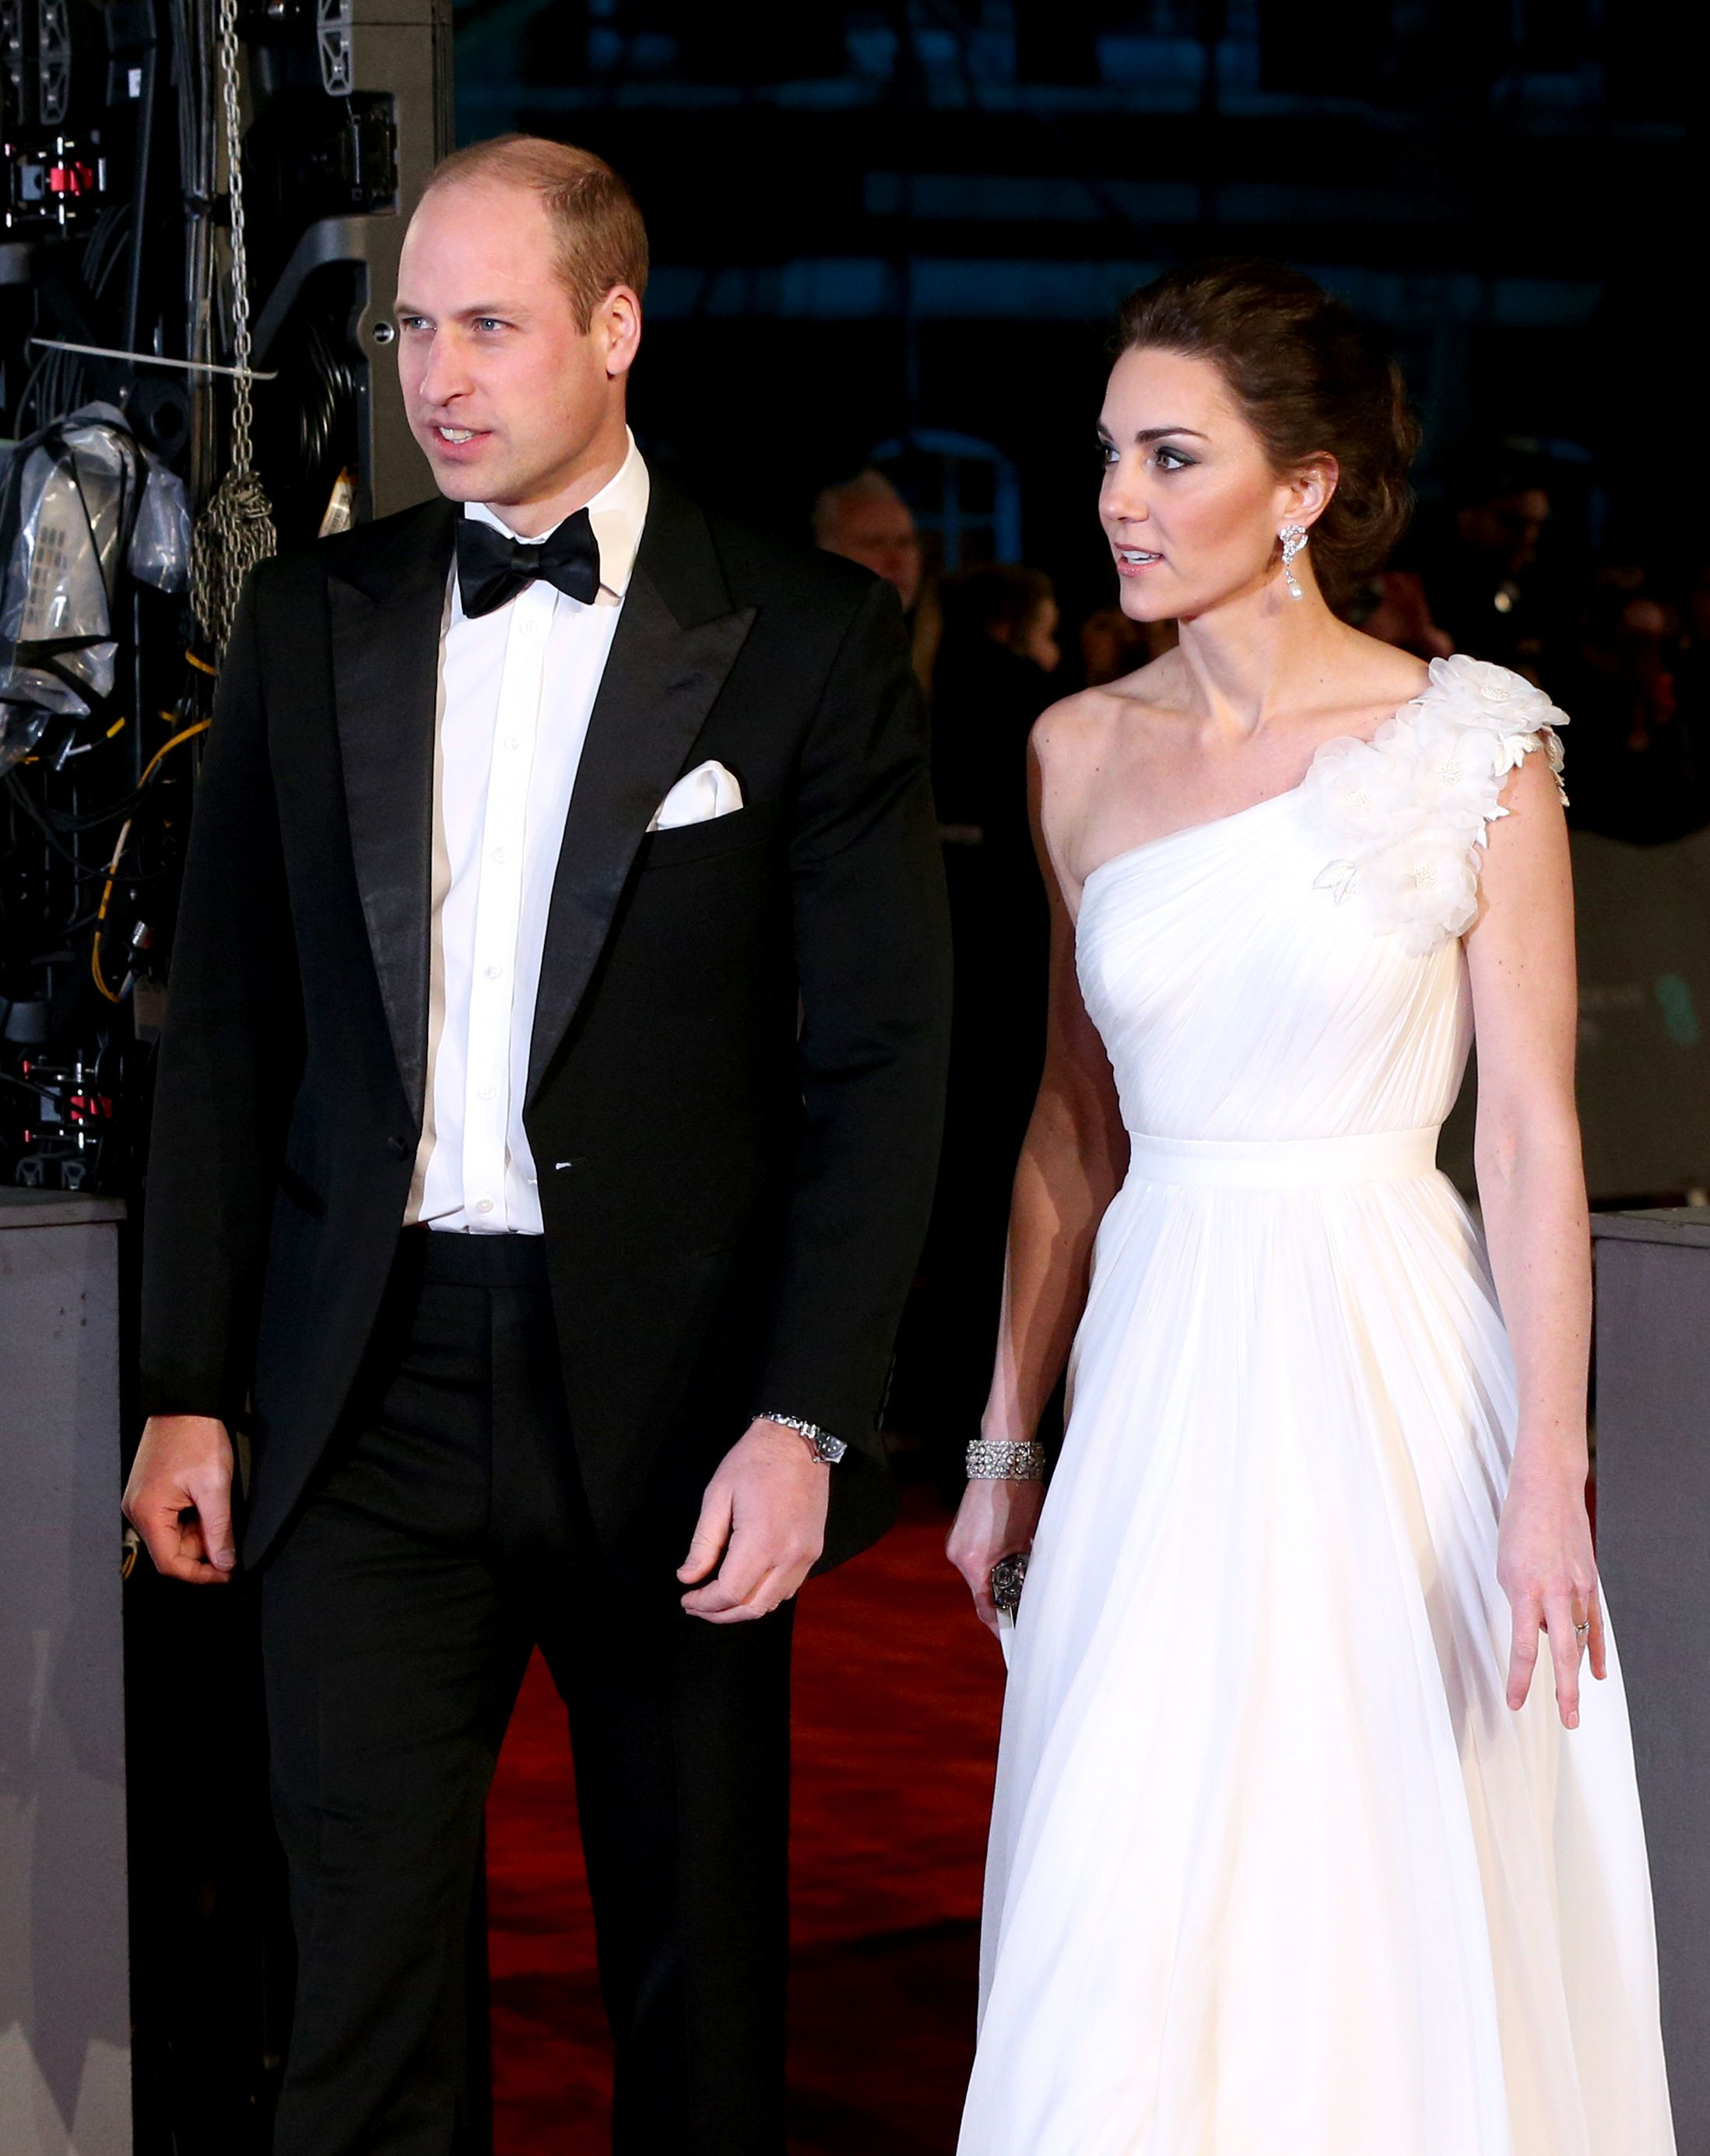 incontro tra il principe william e kate middleton